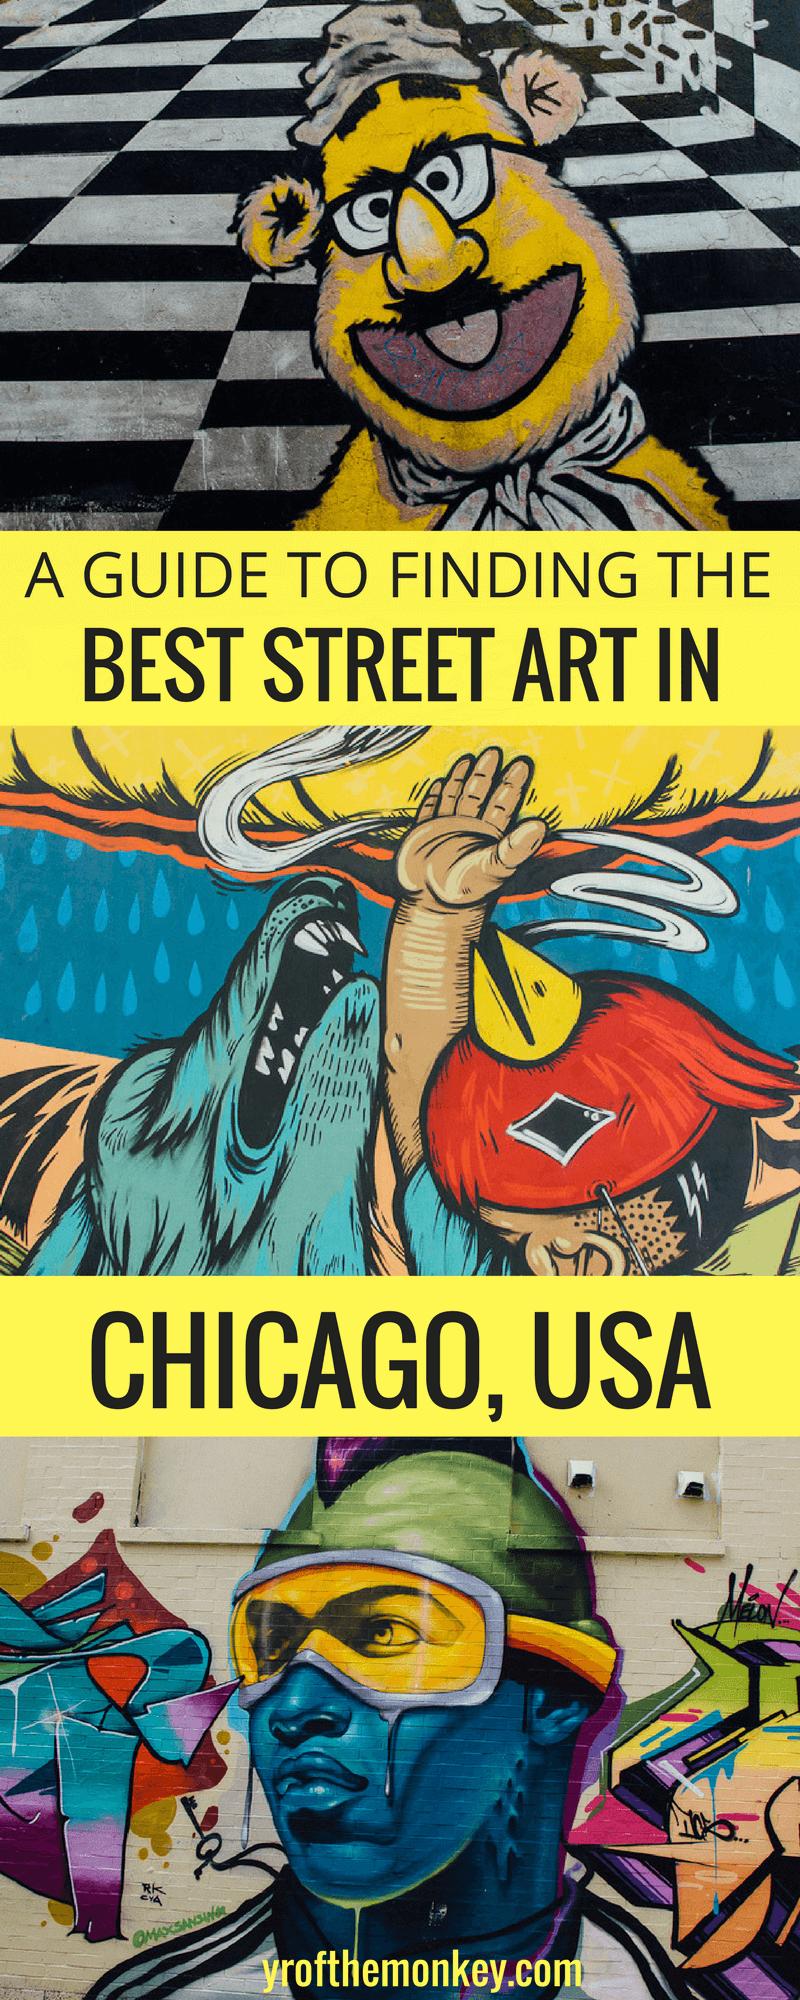 Chicago Street Art I Chicago Usa Travel I Murals Of Chicago I Street Arti Murals I Public Art I Best Neighborhoods Chicago Street Art Travel Usa Chicago Street